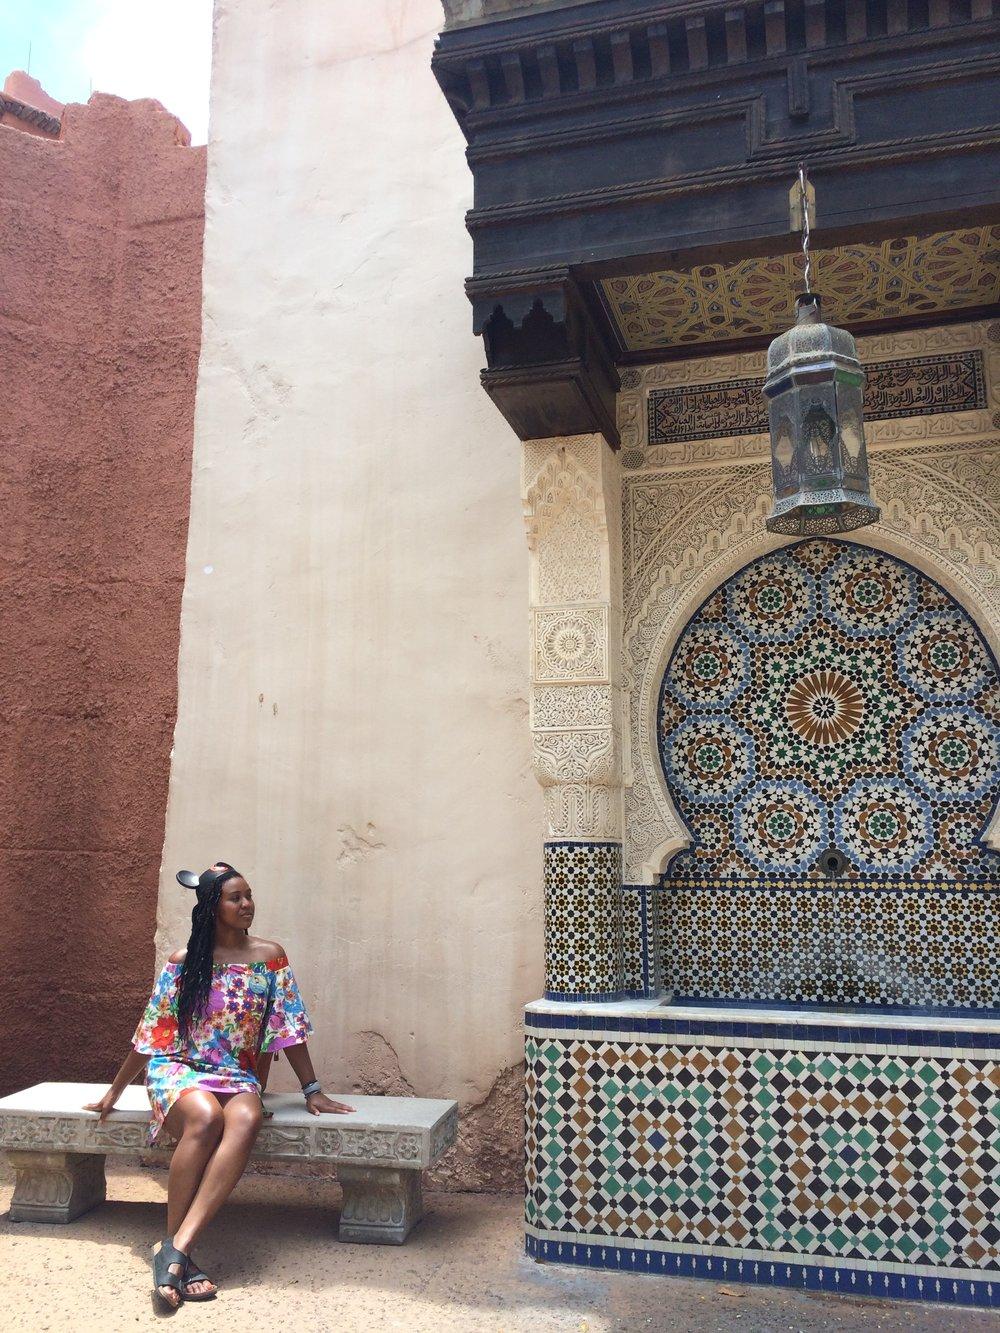 Morocco Epcot, Disney World, Orlando Florida, USA. July 2017.